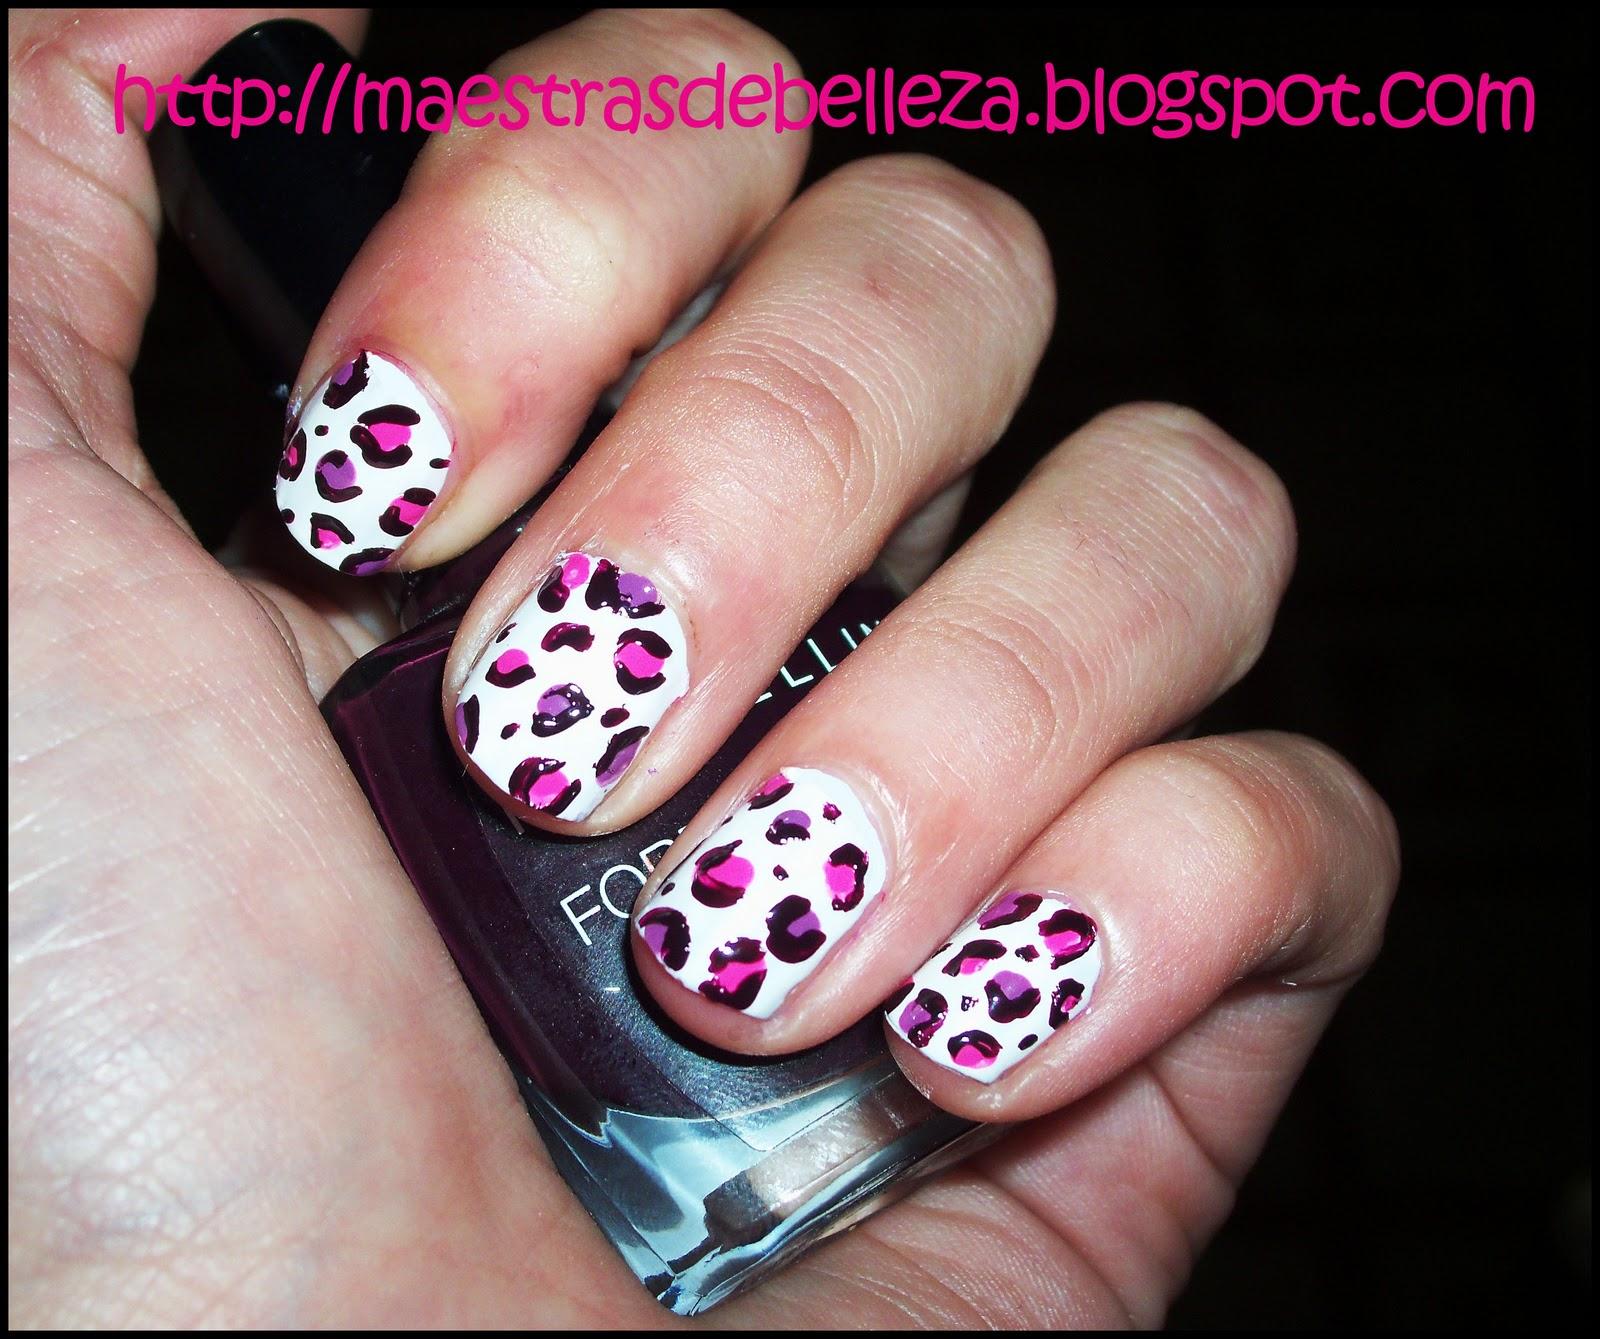 Nailistas | Nail art paso a paso | Blog de diseños de uñas